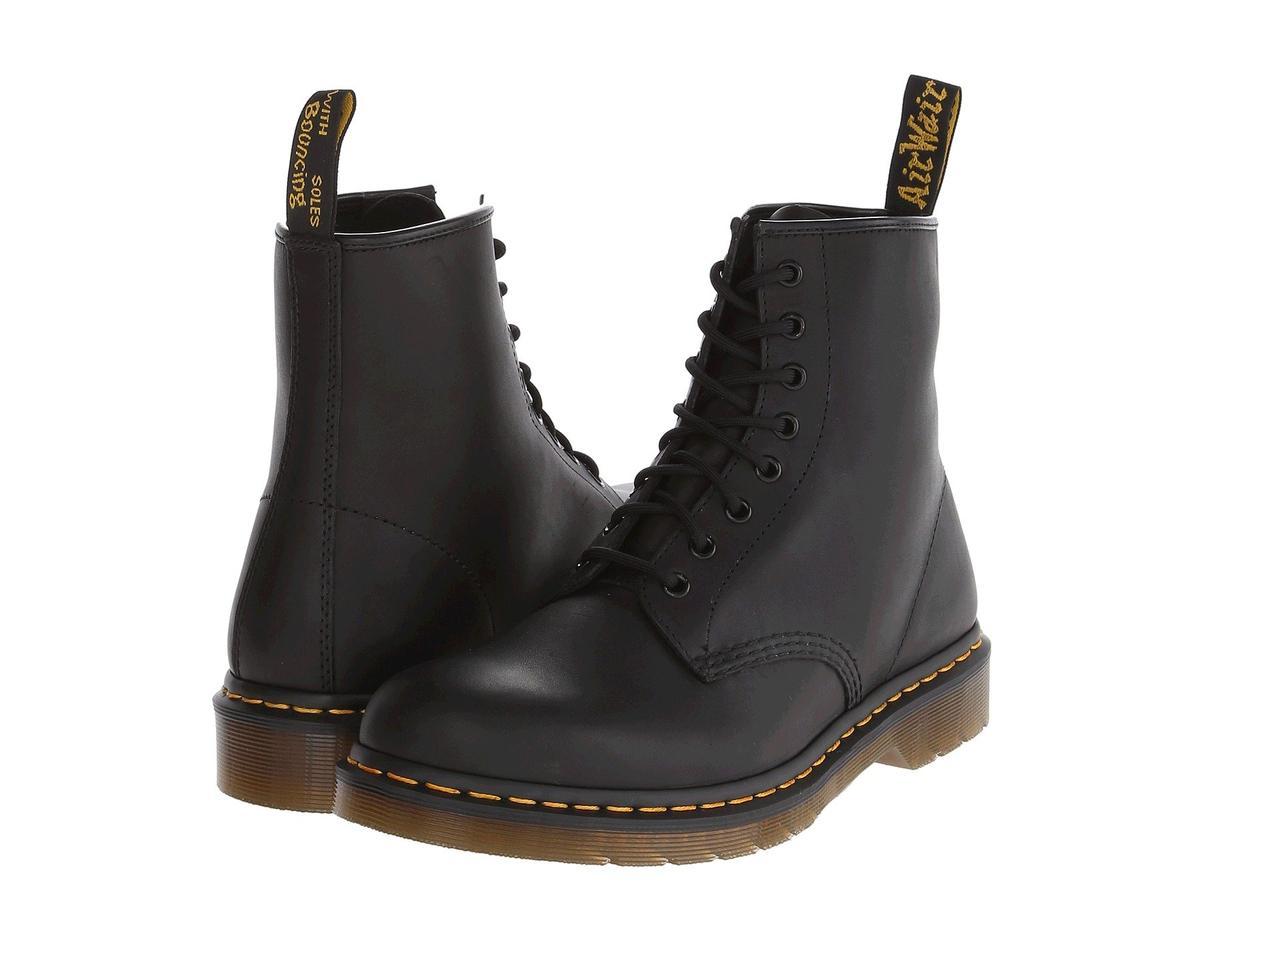 Ботинки Сапоги (Оригинал) Dr. Martens 1460 Black Greasy - TopUSA